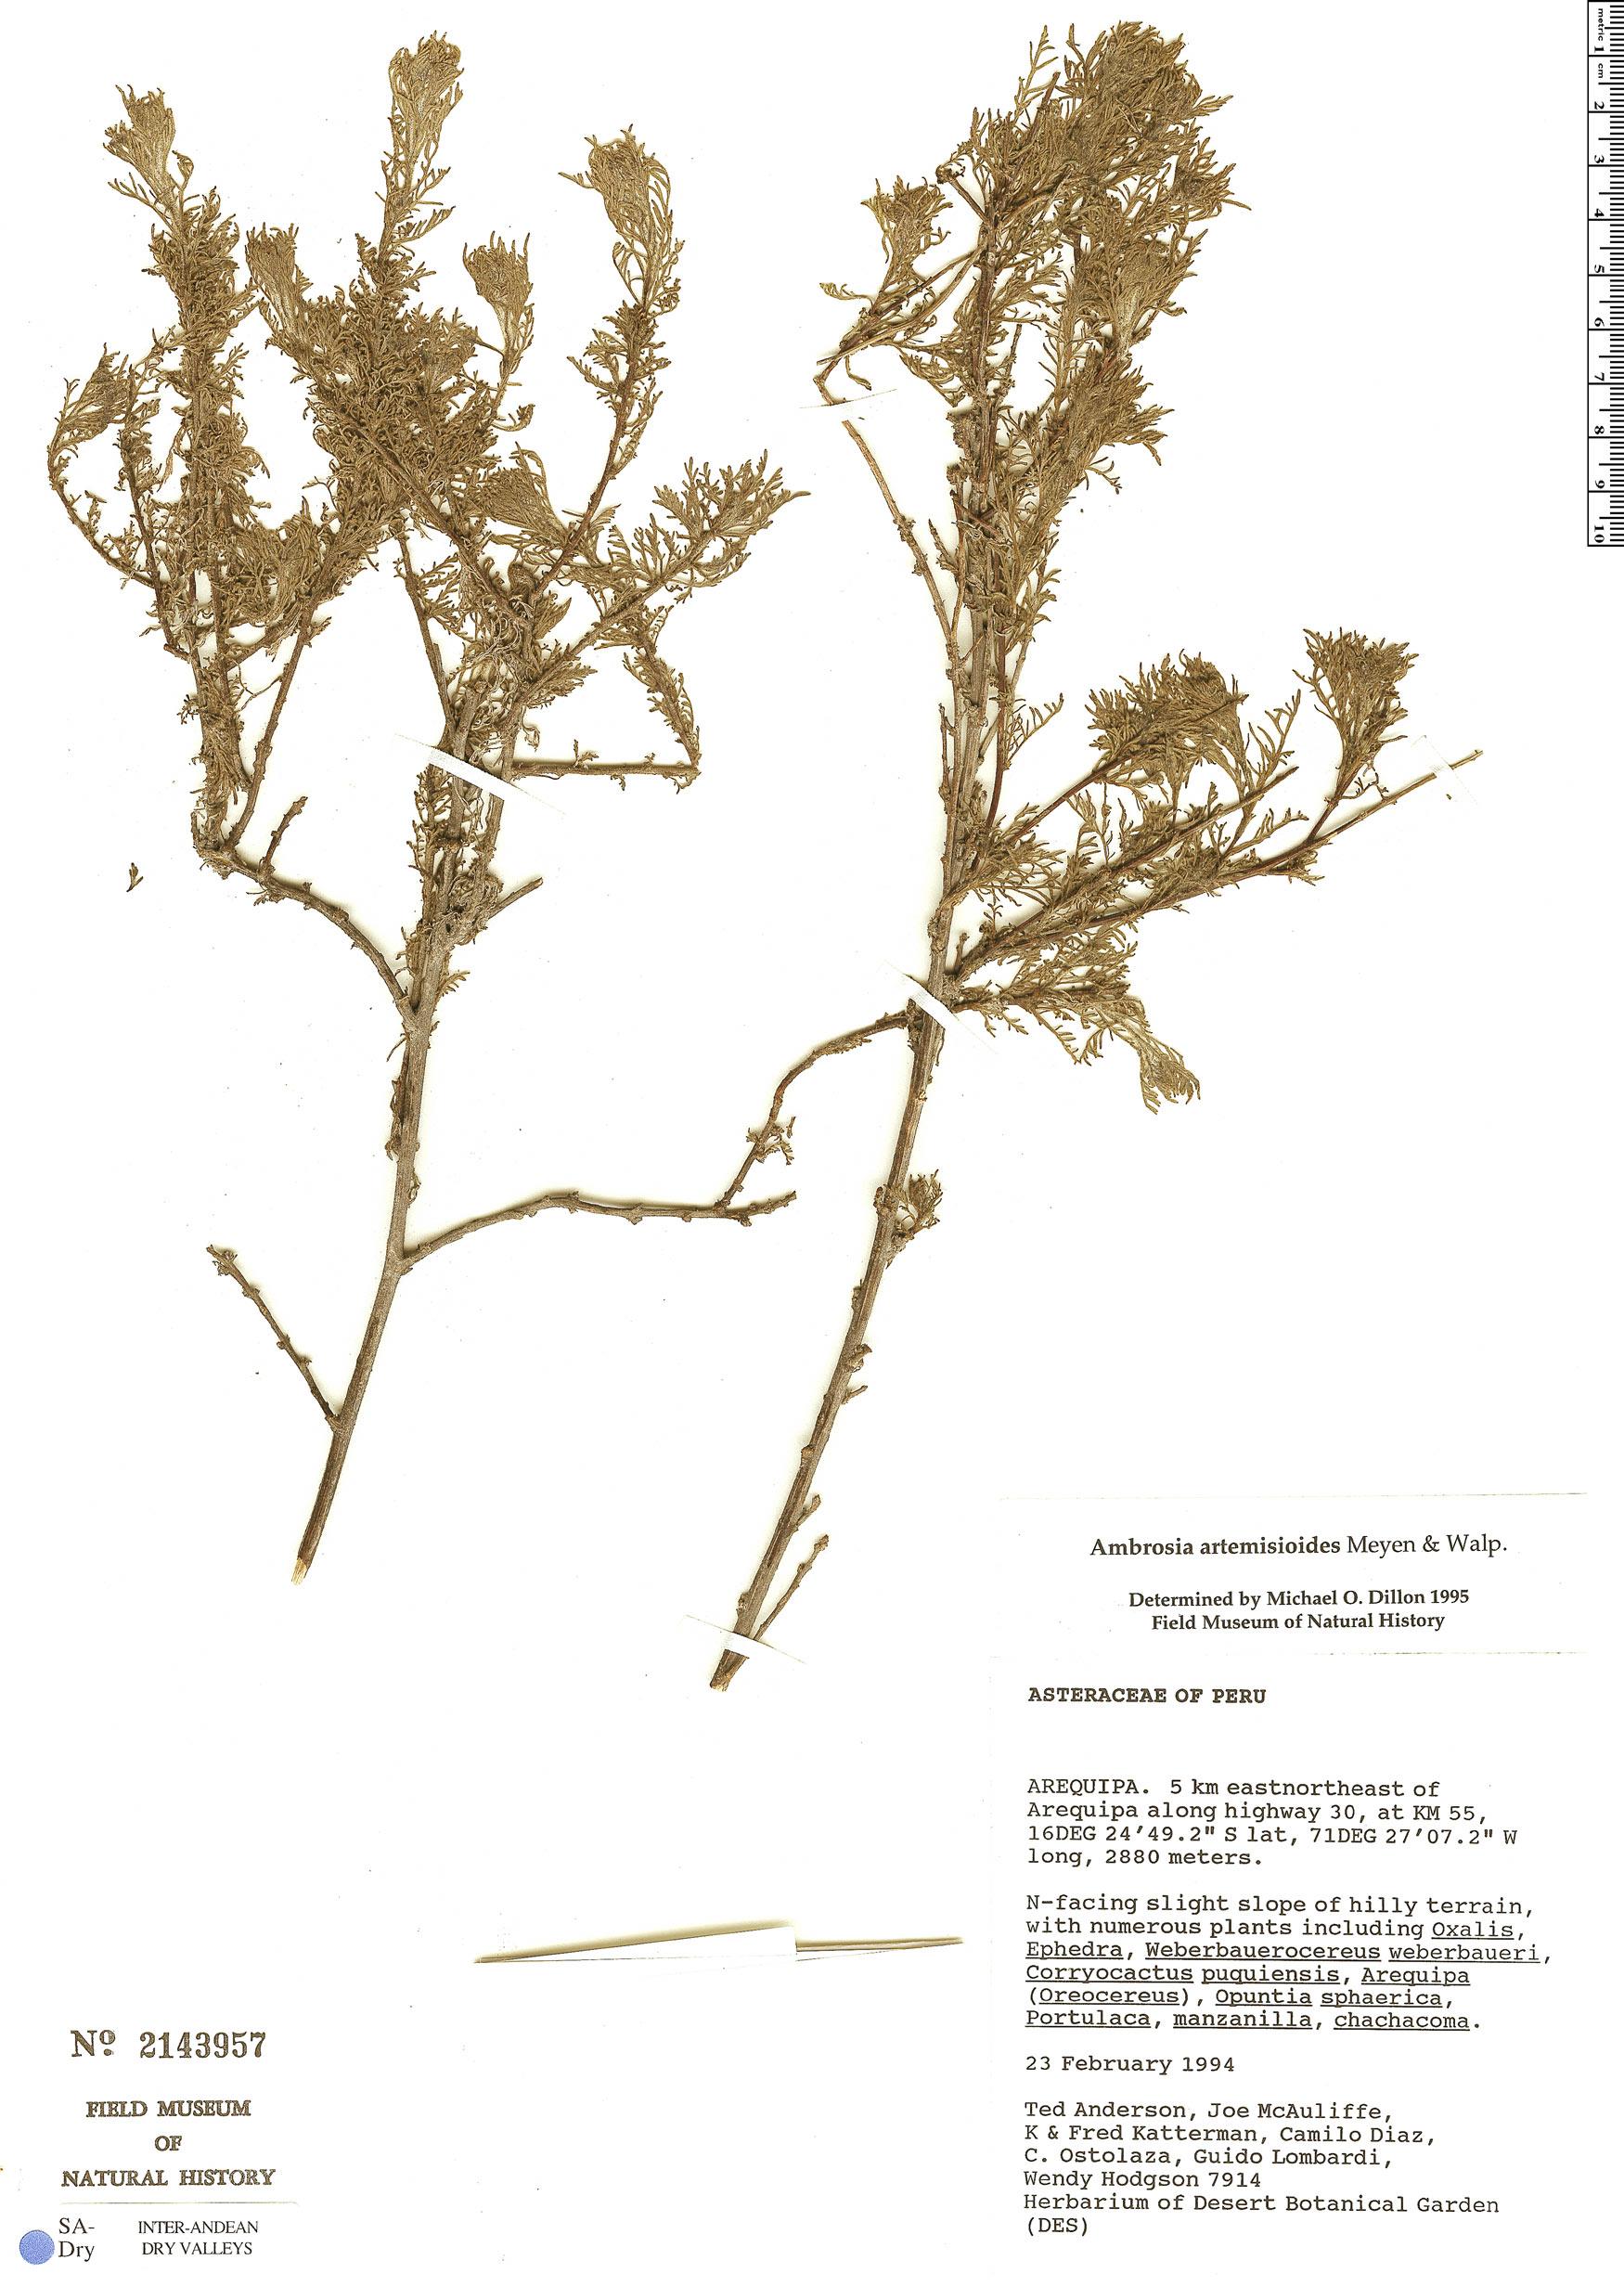 Ambrosia artemisioides image